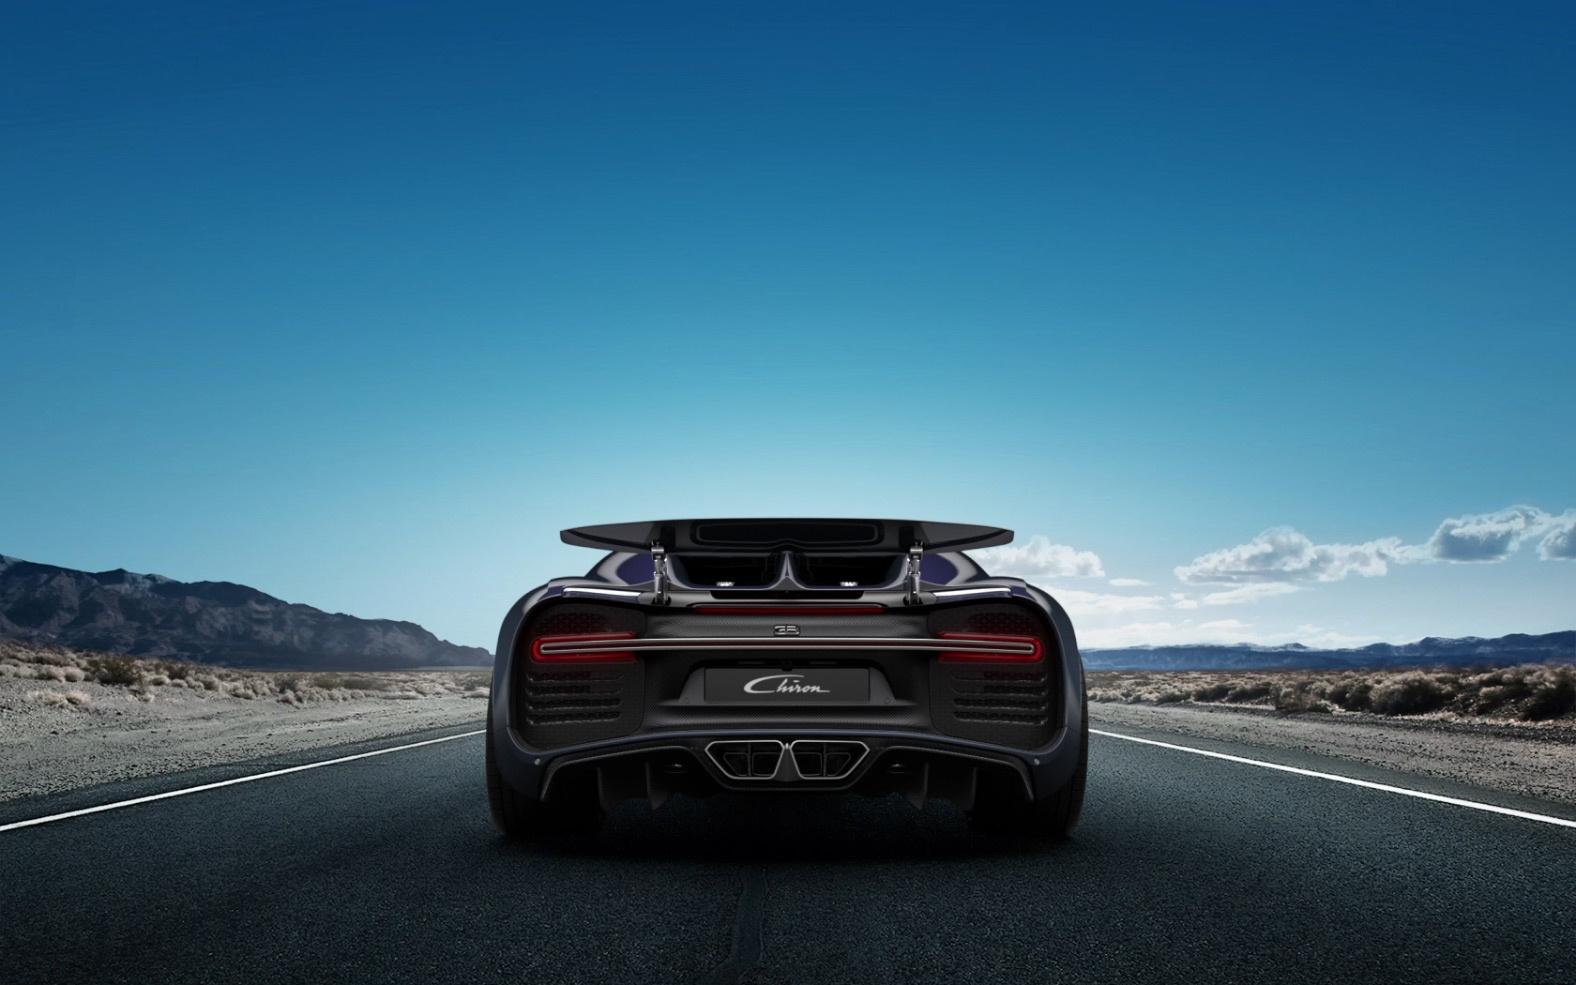 bugatti chiron pack handling top speed 480km h gta5. Black Bedroom Furniture Sets. Home Design Ideas